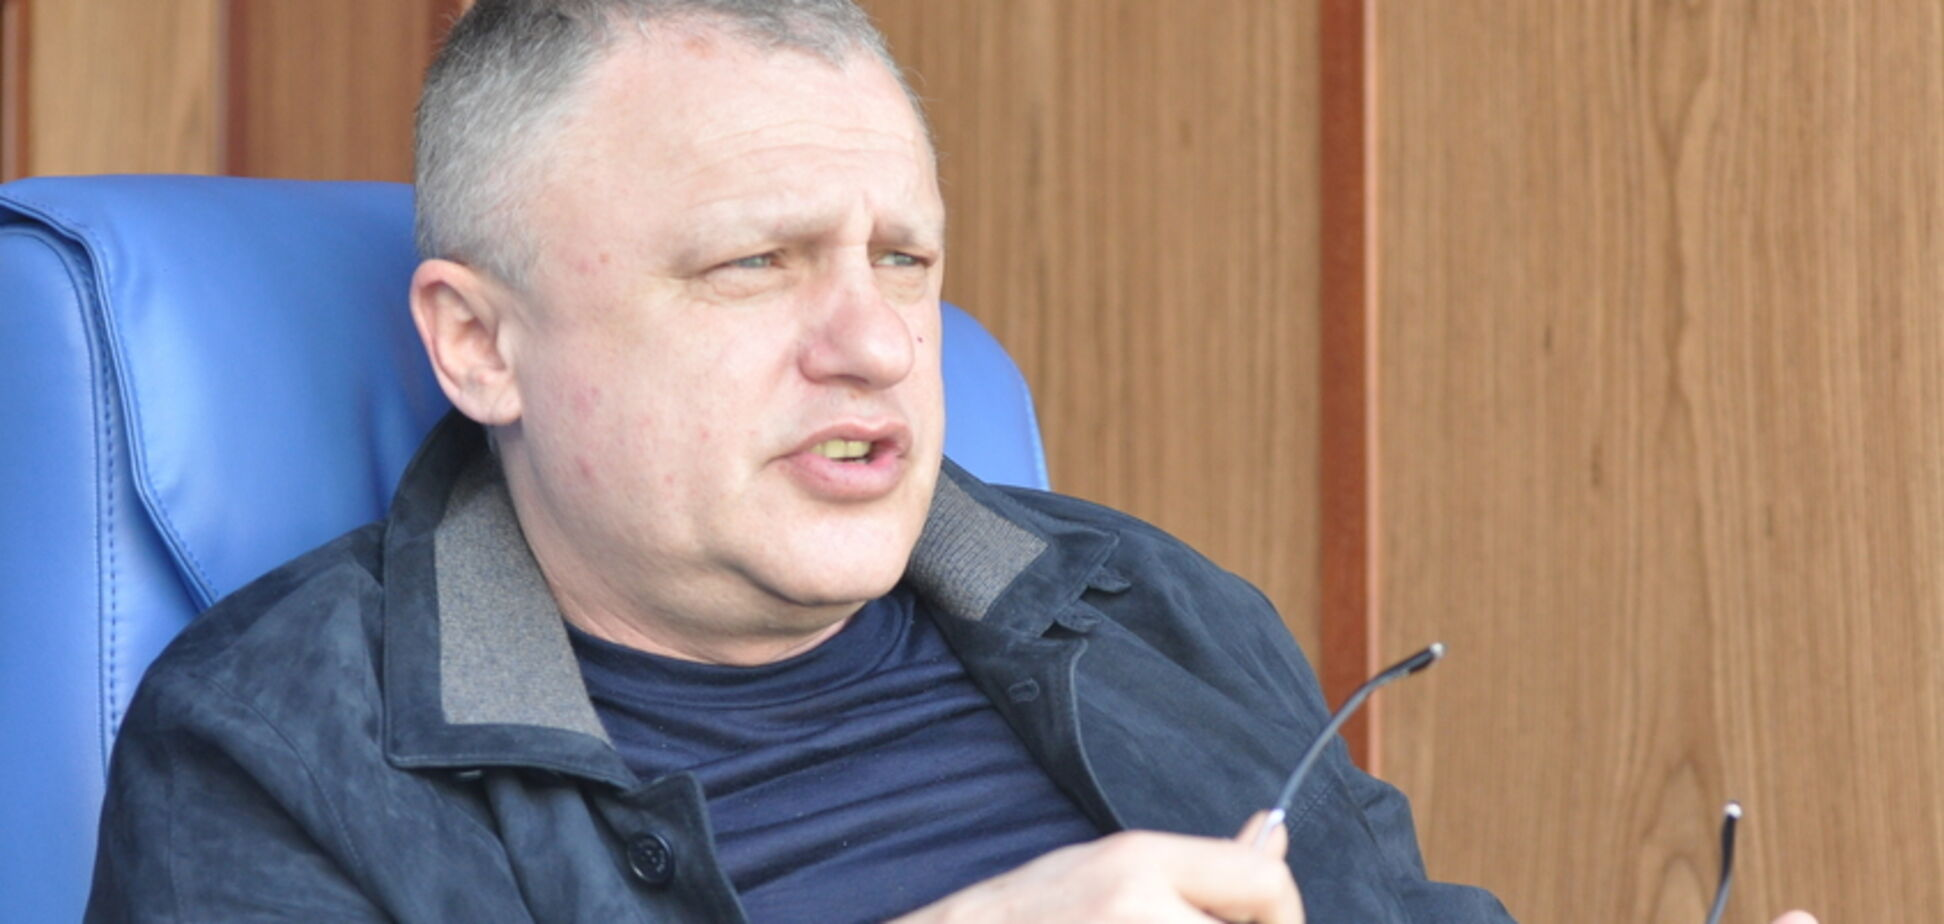 'Дедушка обижен': появилась реакция Суркиса на смену тренера в 'Динамо'